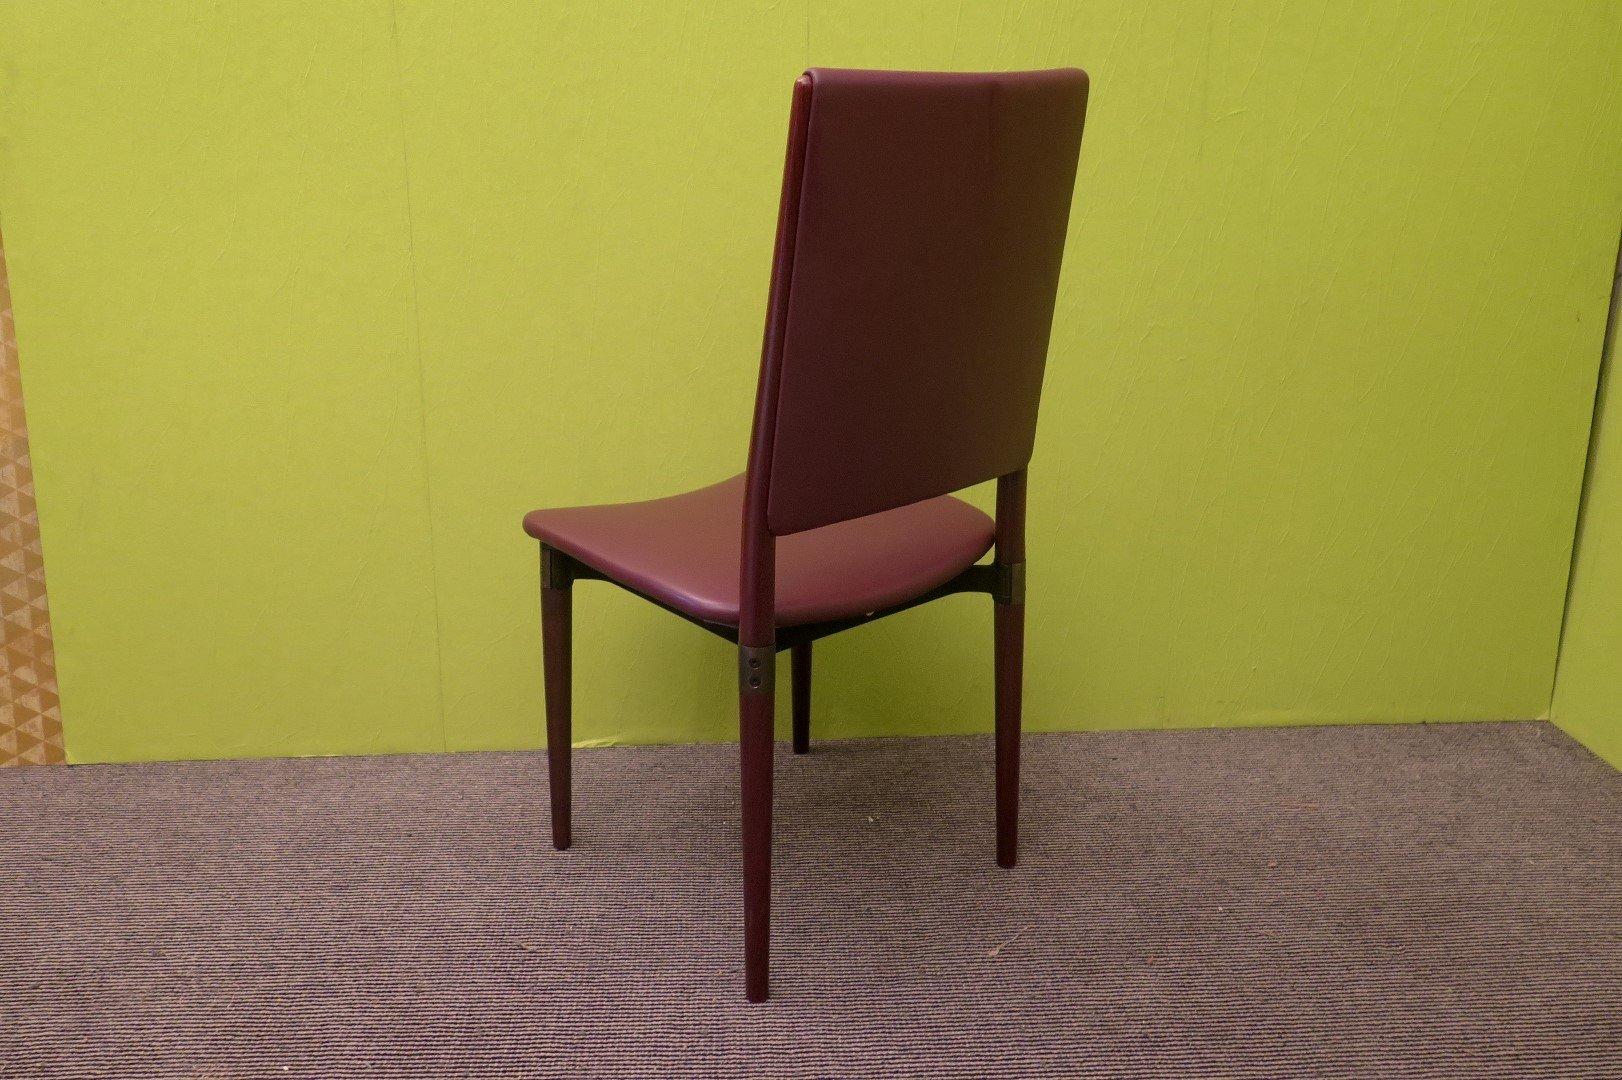 Stühle aus Holz & Leder von Osvaldo Borsani für Tecno ...